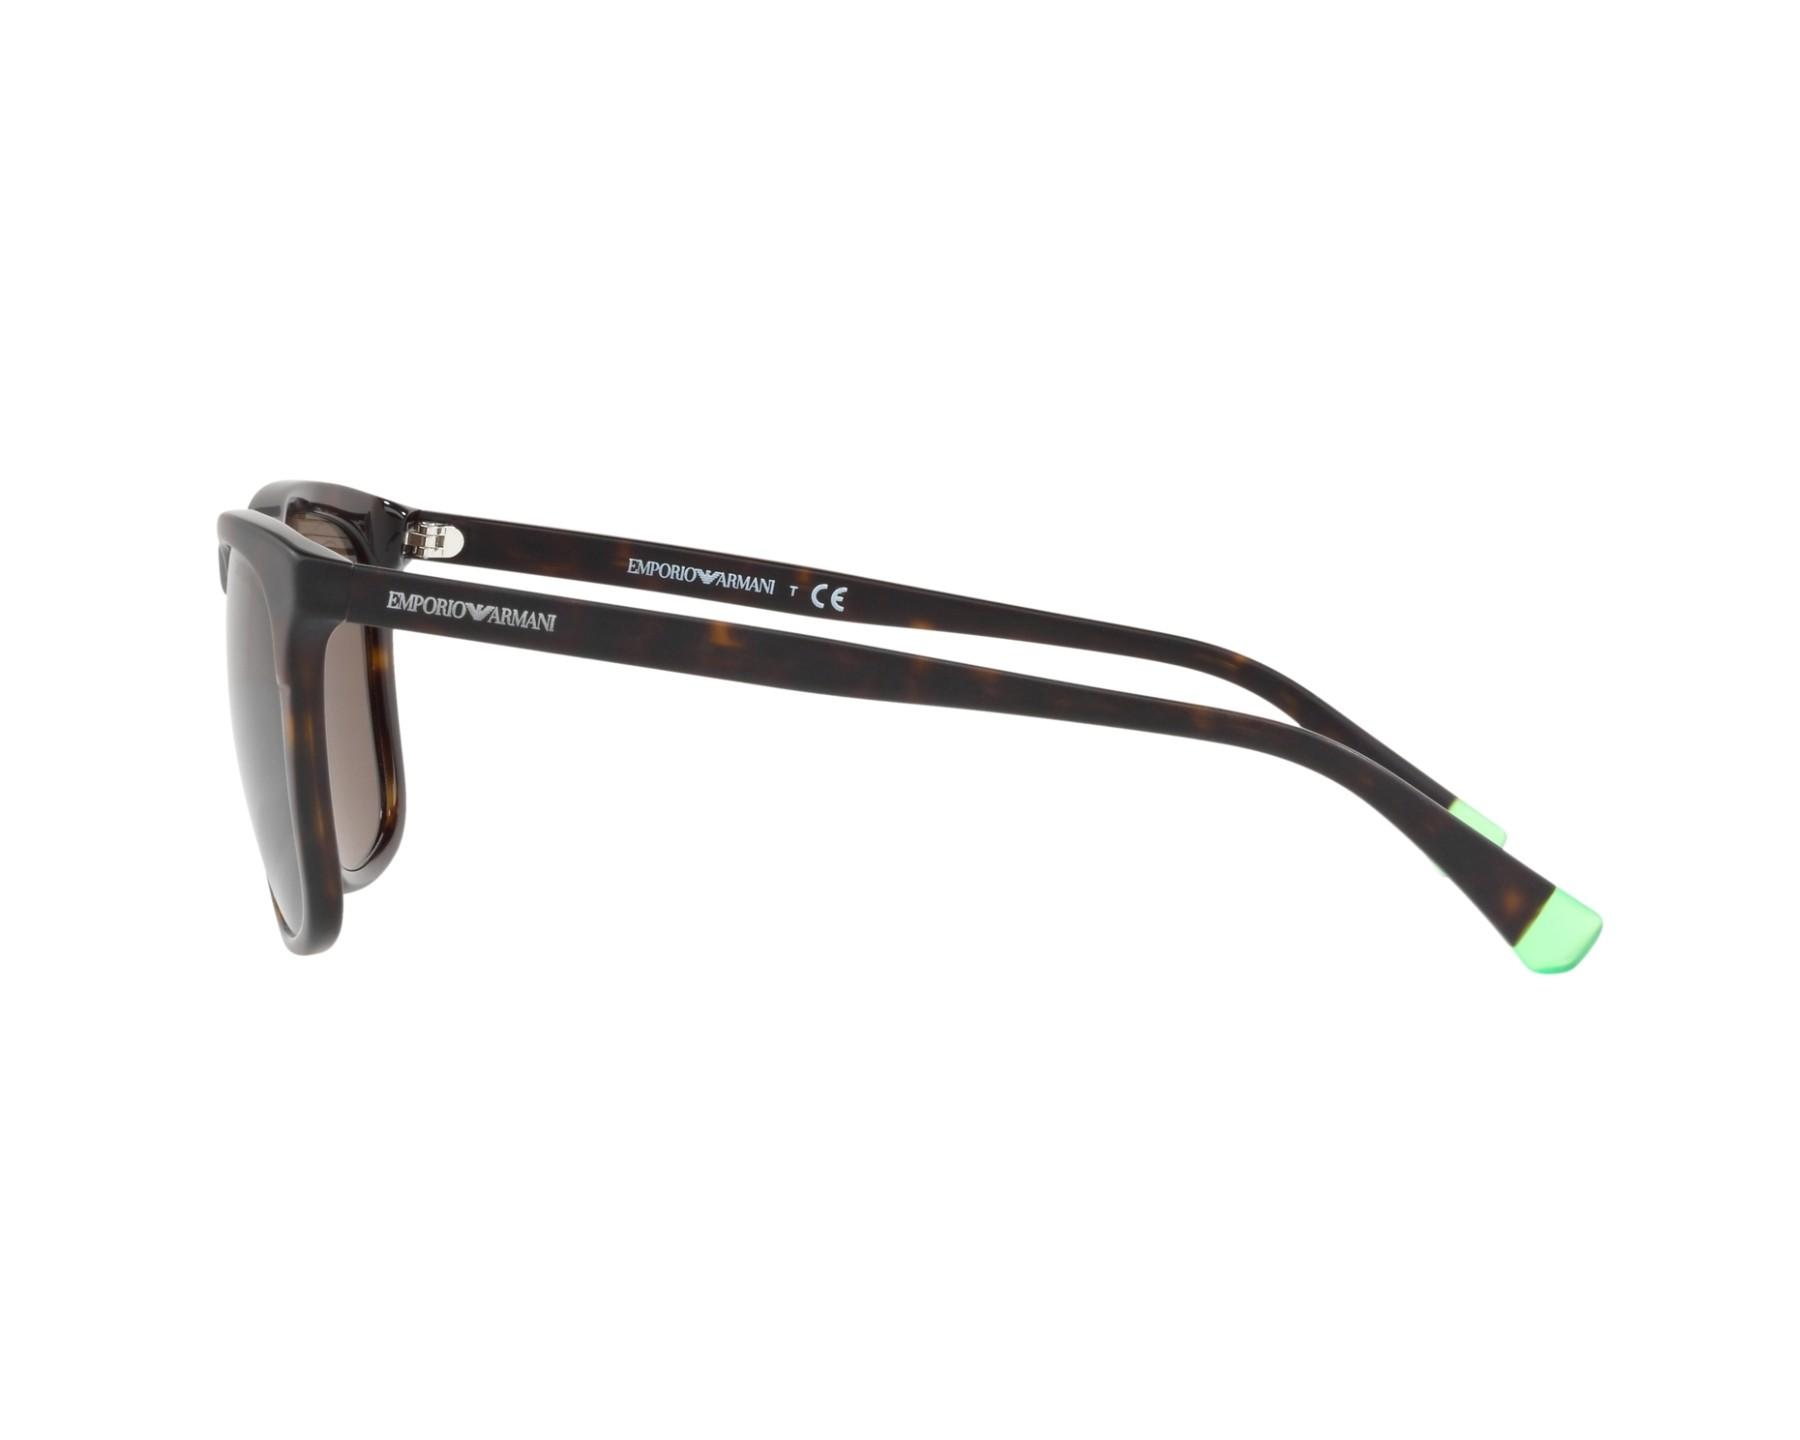 Sunglasses Emporio Armani EA-4105 508973 53-20 Havana 360 degree view 4 4253aa1b93